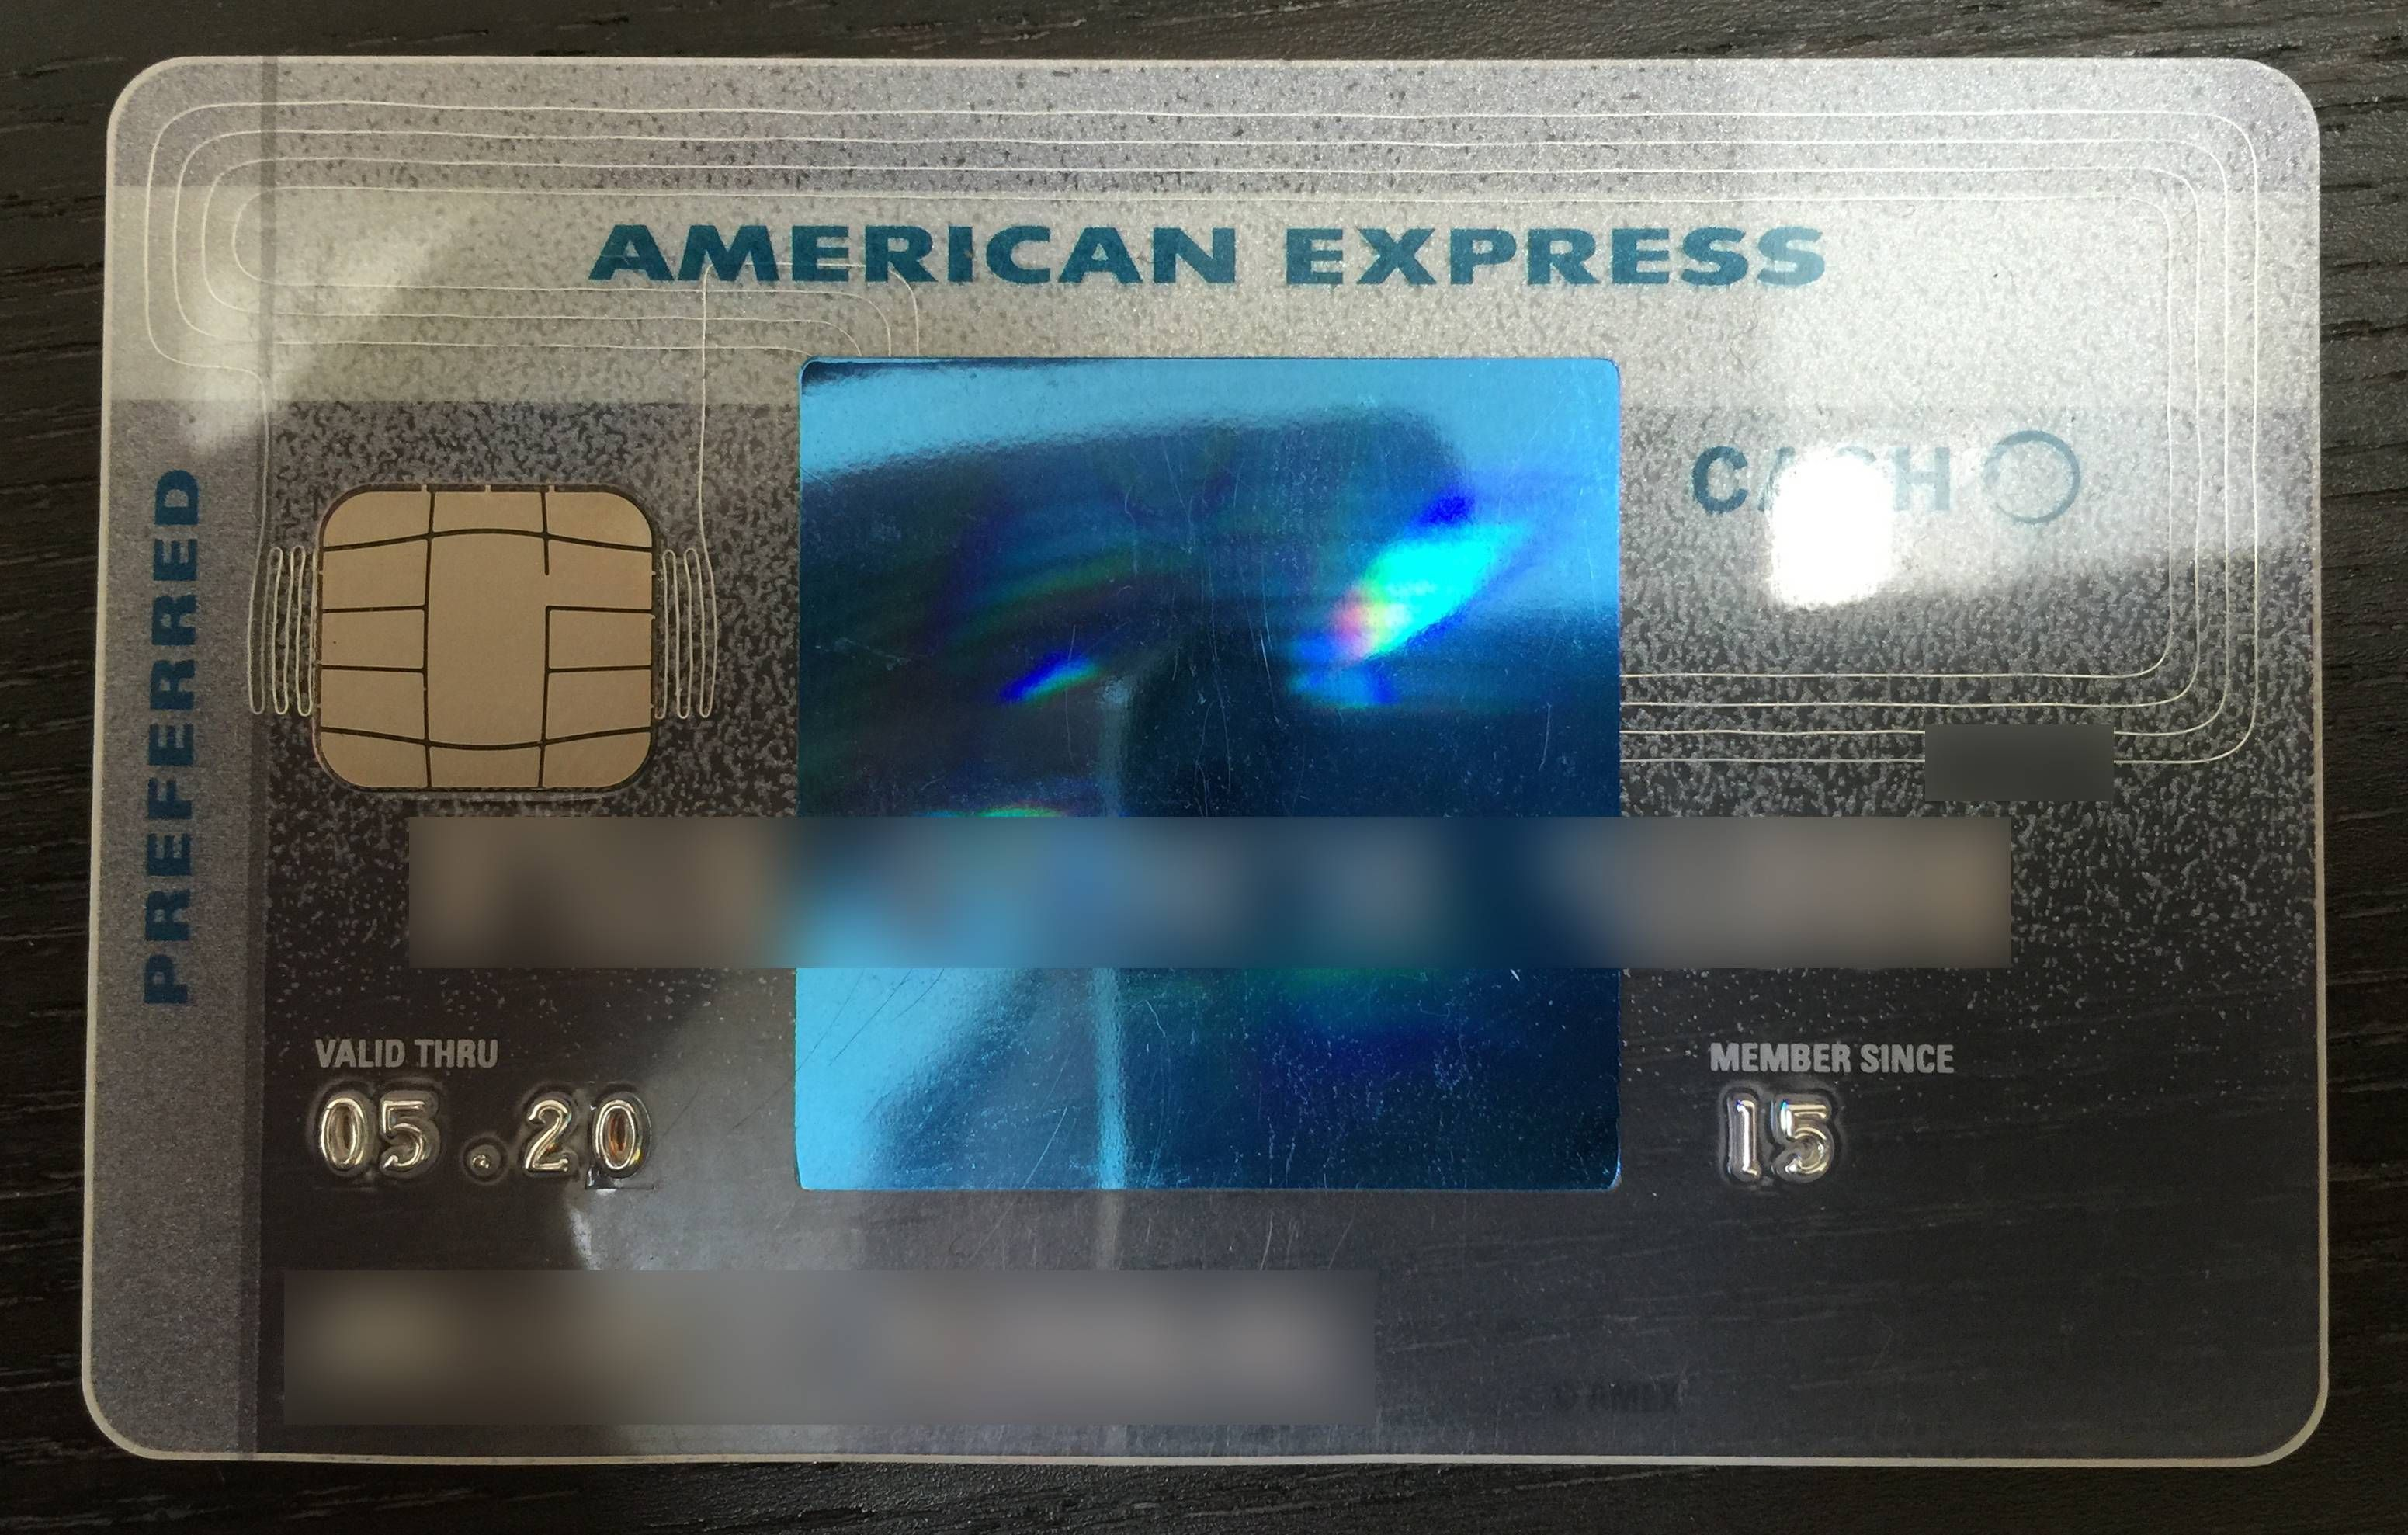 amex blue cash - Google Search | Credit card designs | Pinterest